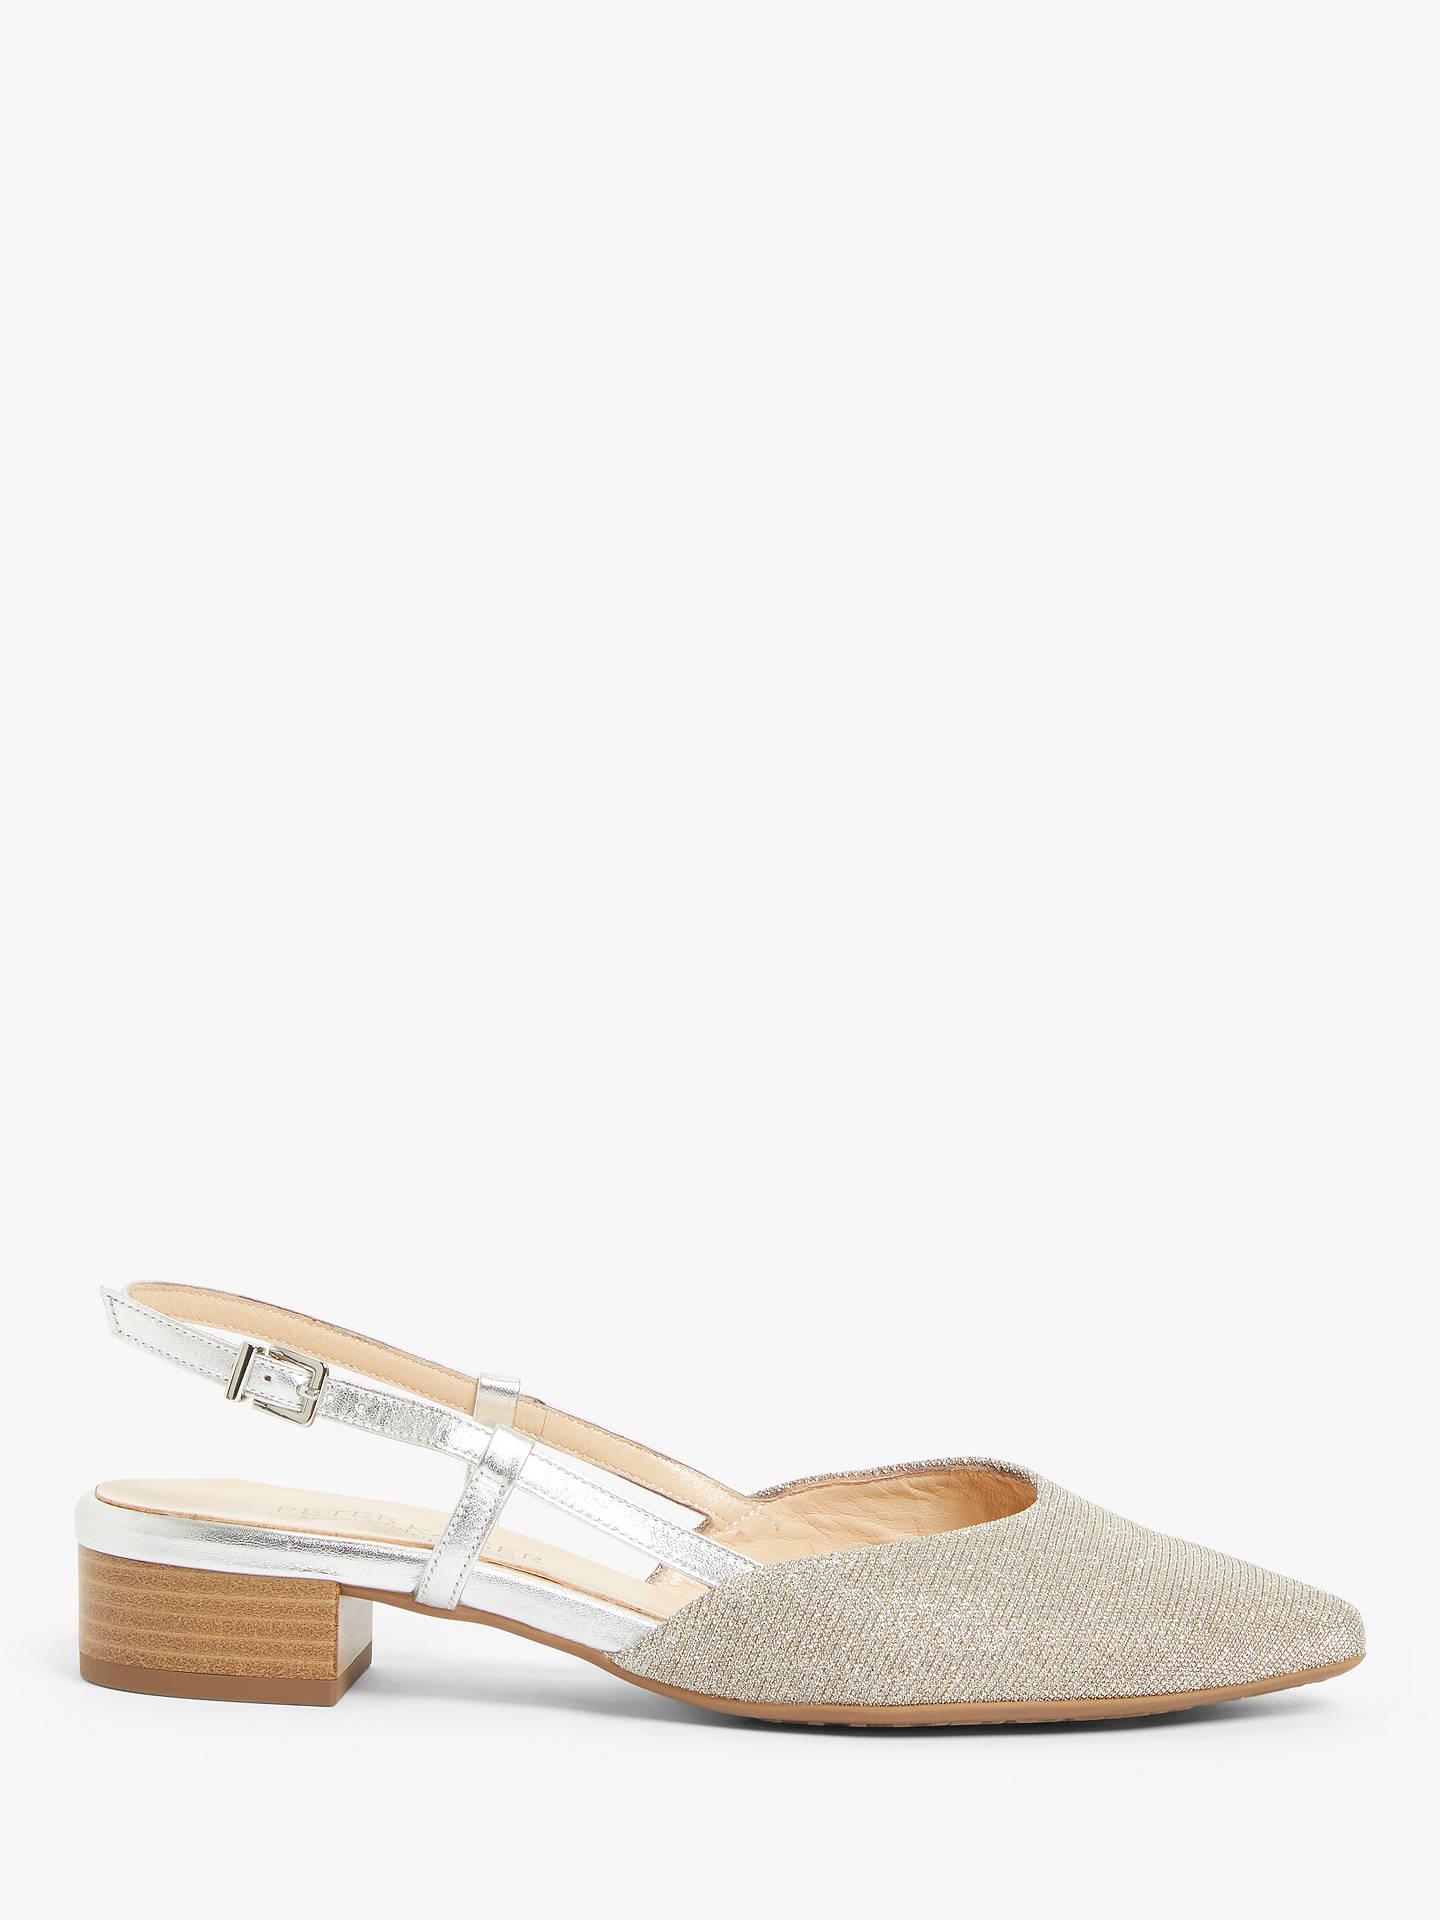 newest bfdb7 4d919 Peter Kaiser Calida Block Heel Slingback Court Shoes, Sand ...